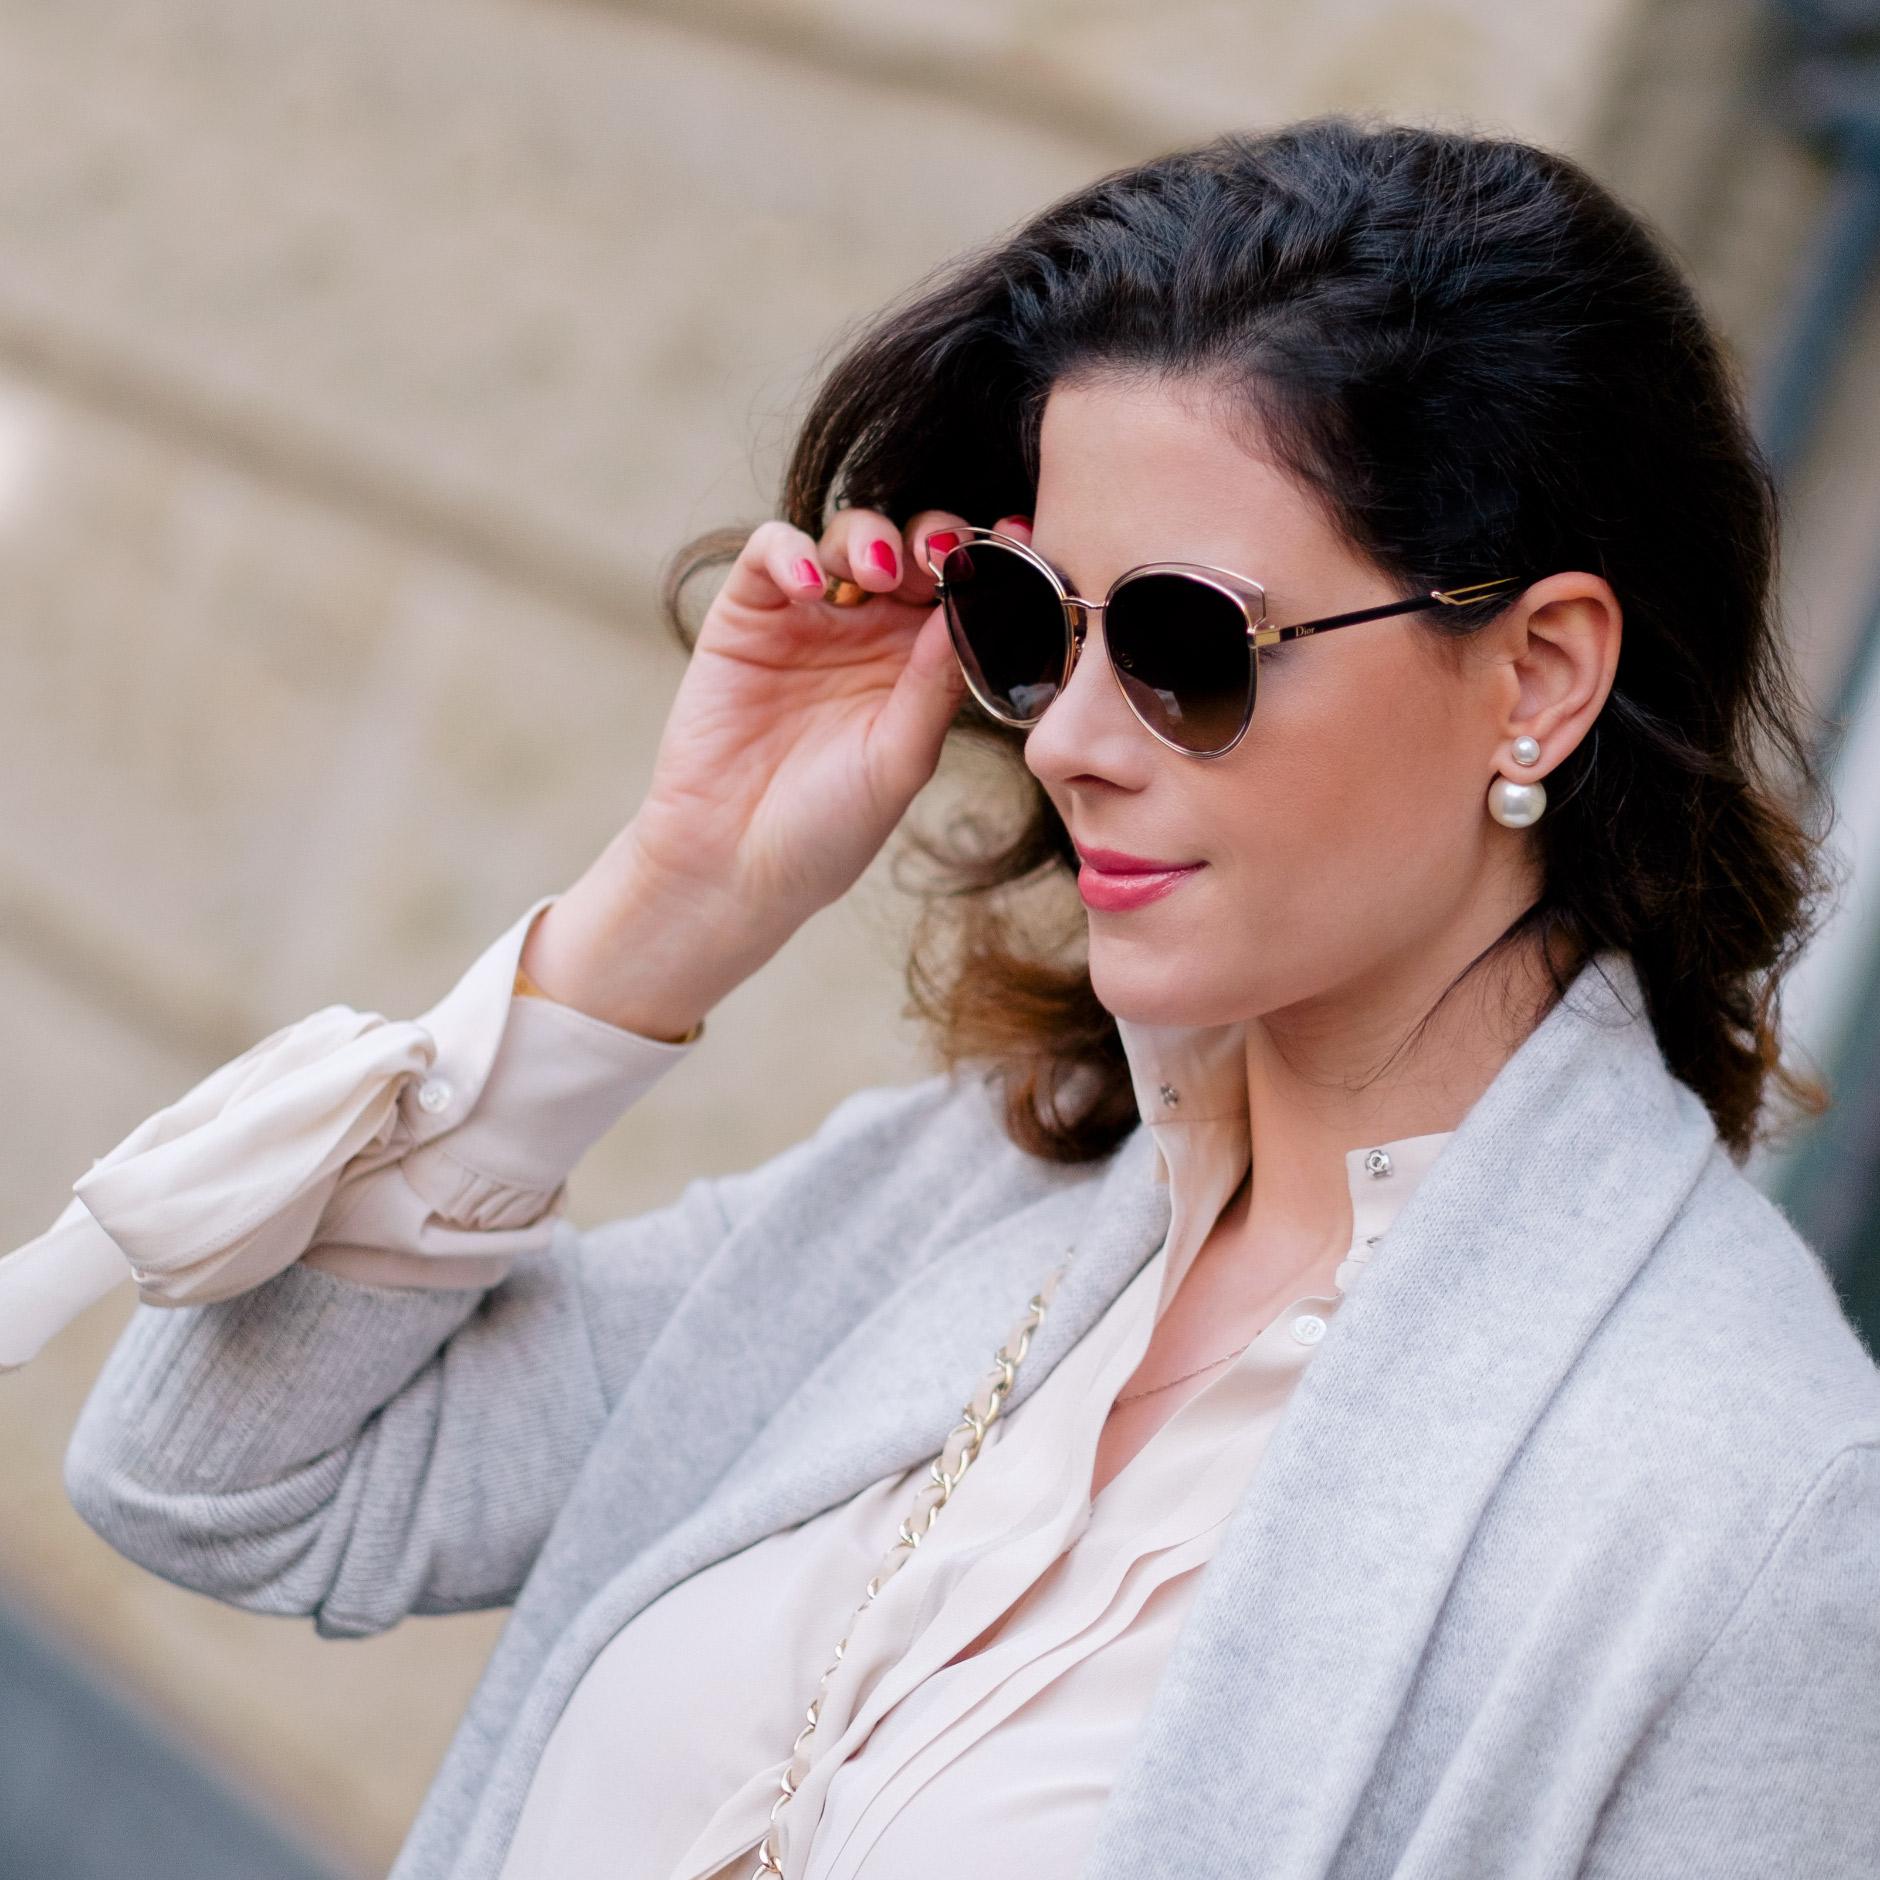 dior-sideral-sunglasses